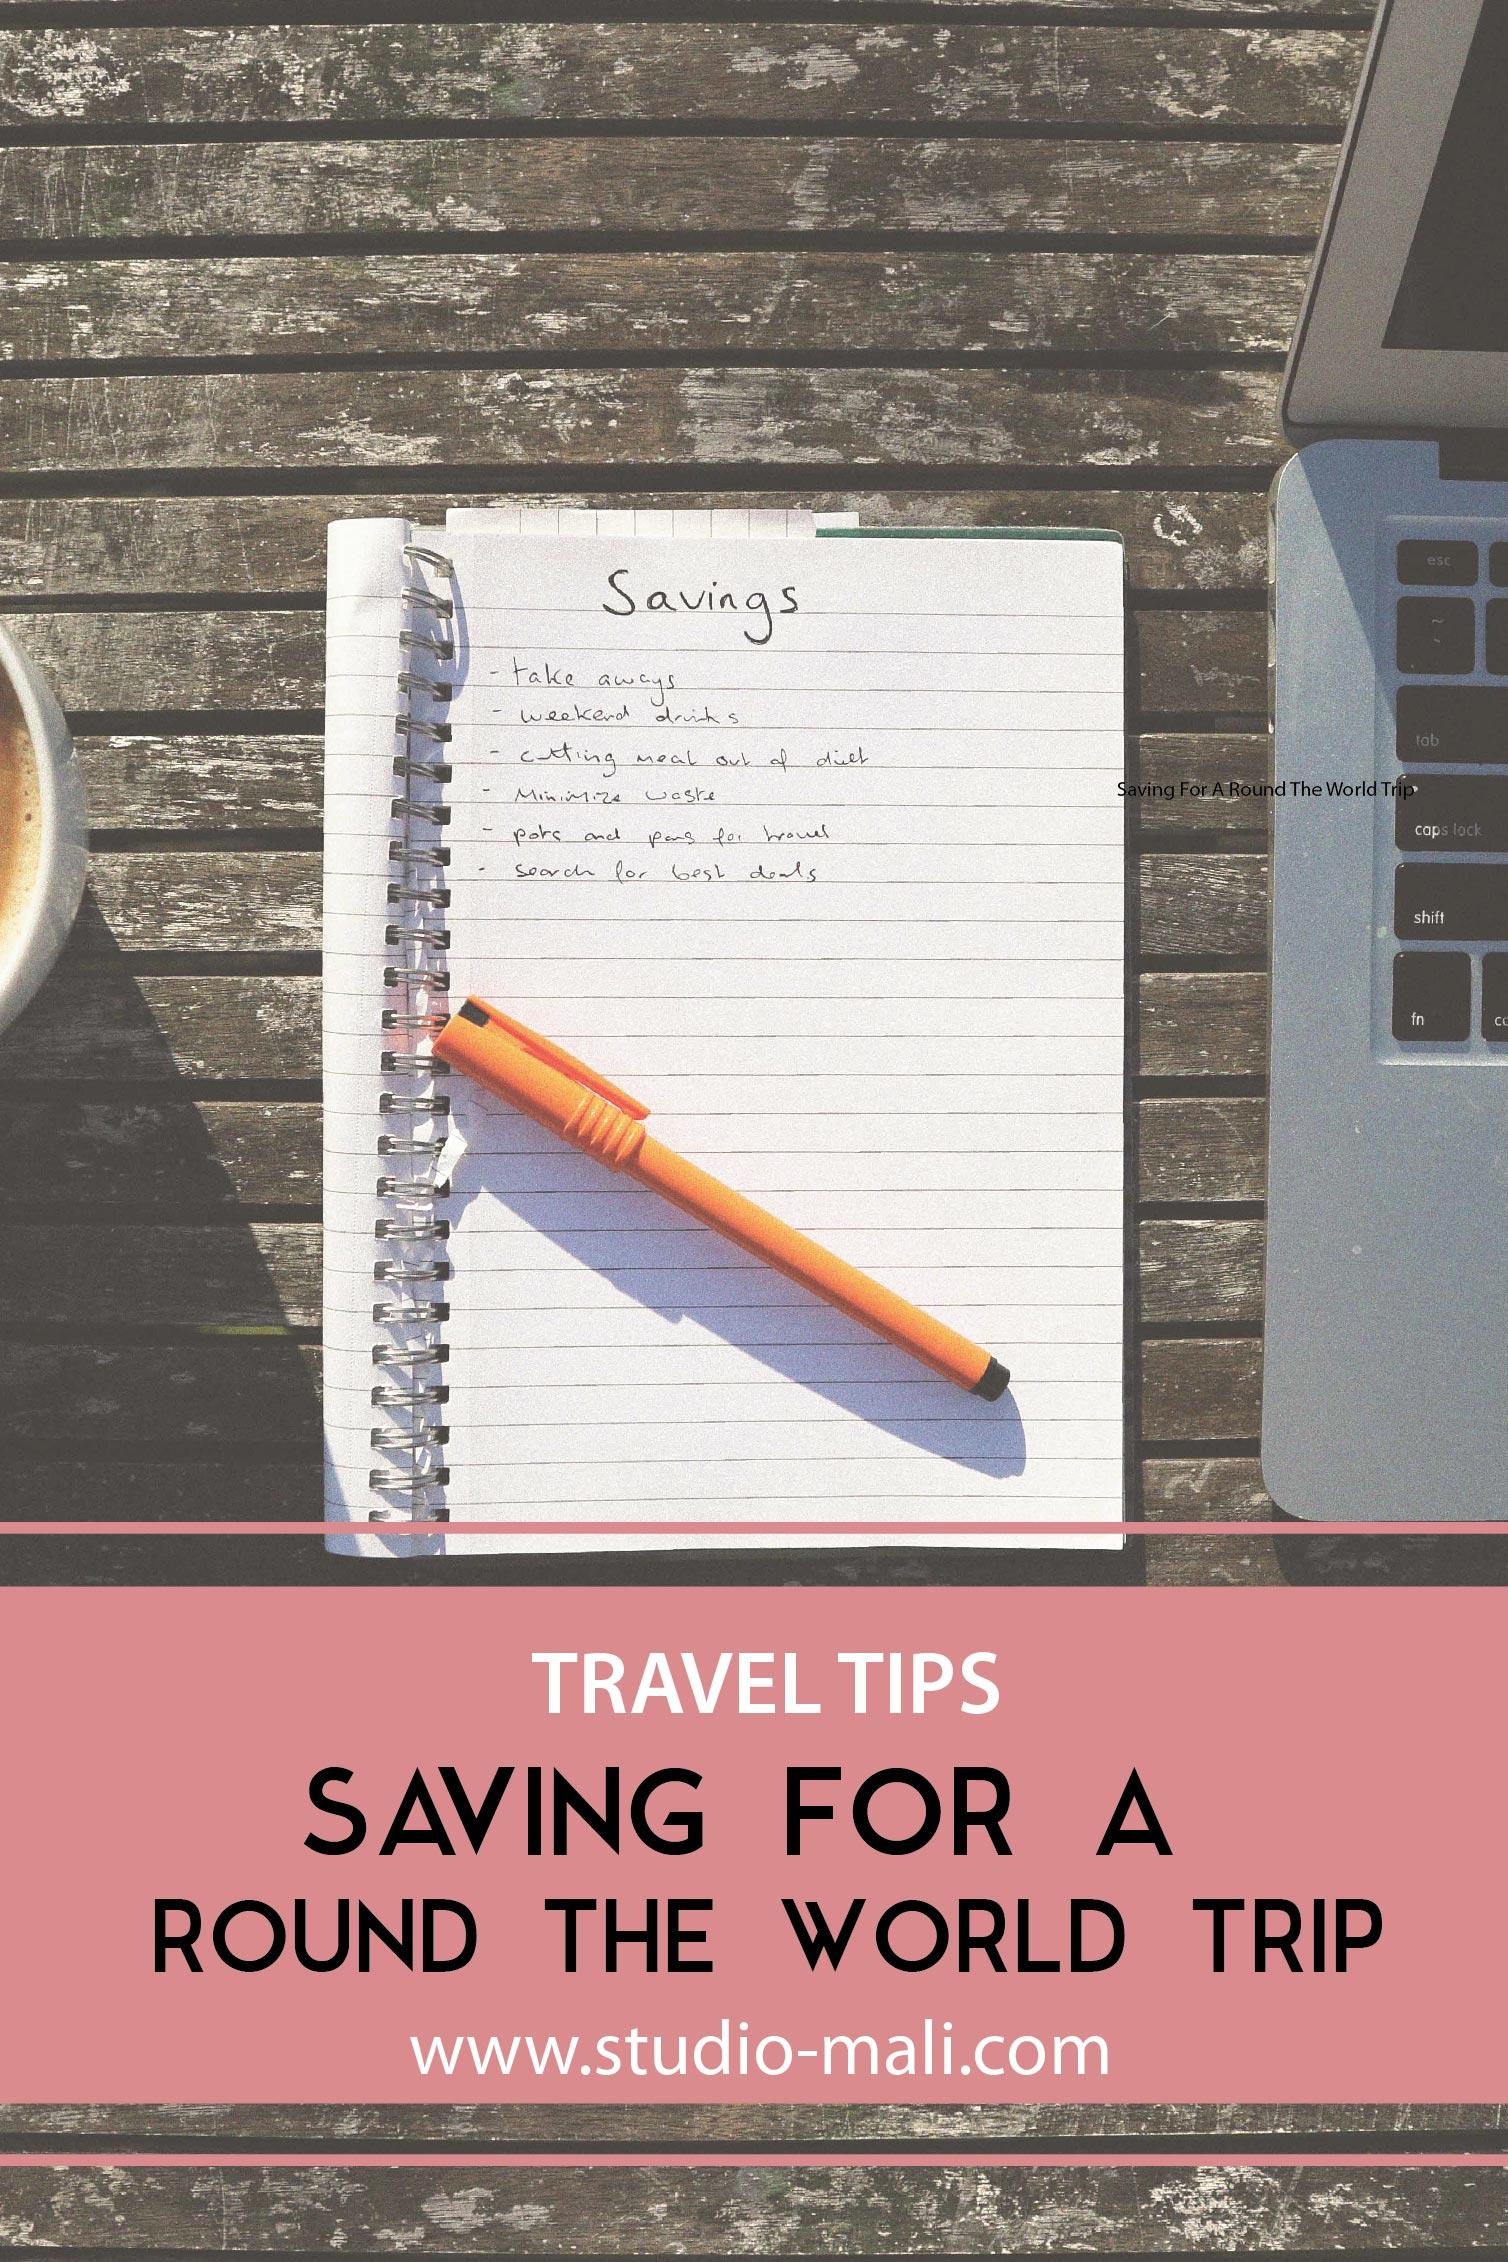 saving for a round the world trip-07.jpg